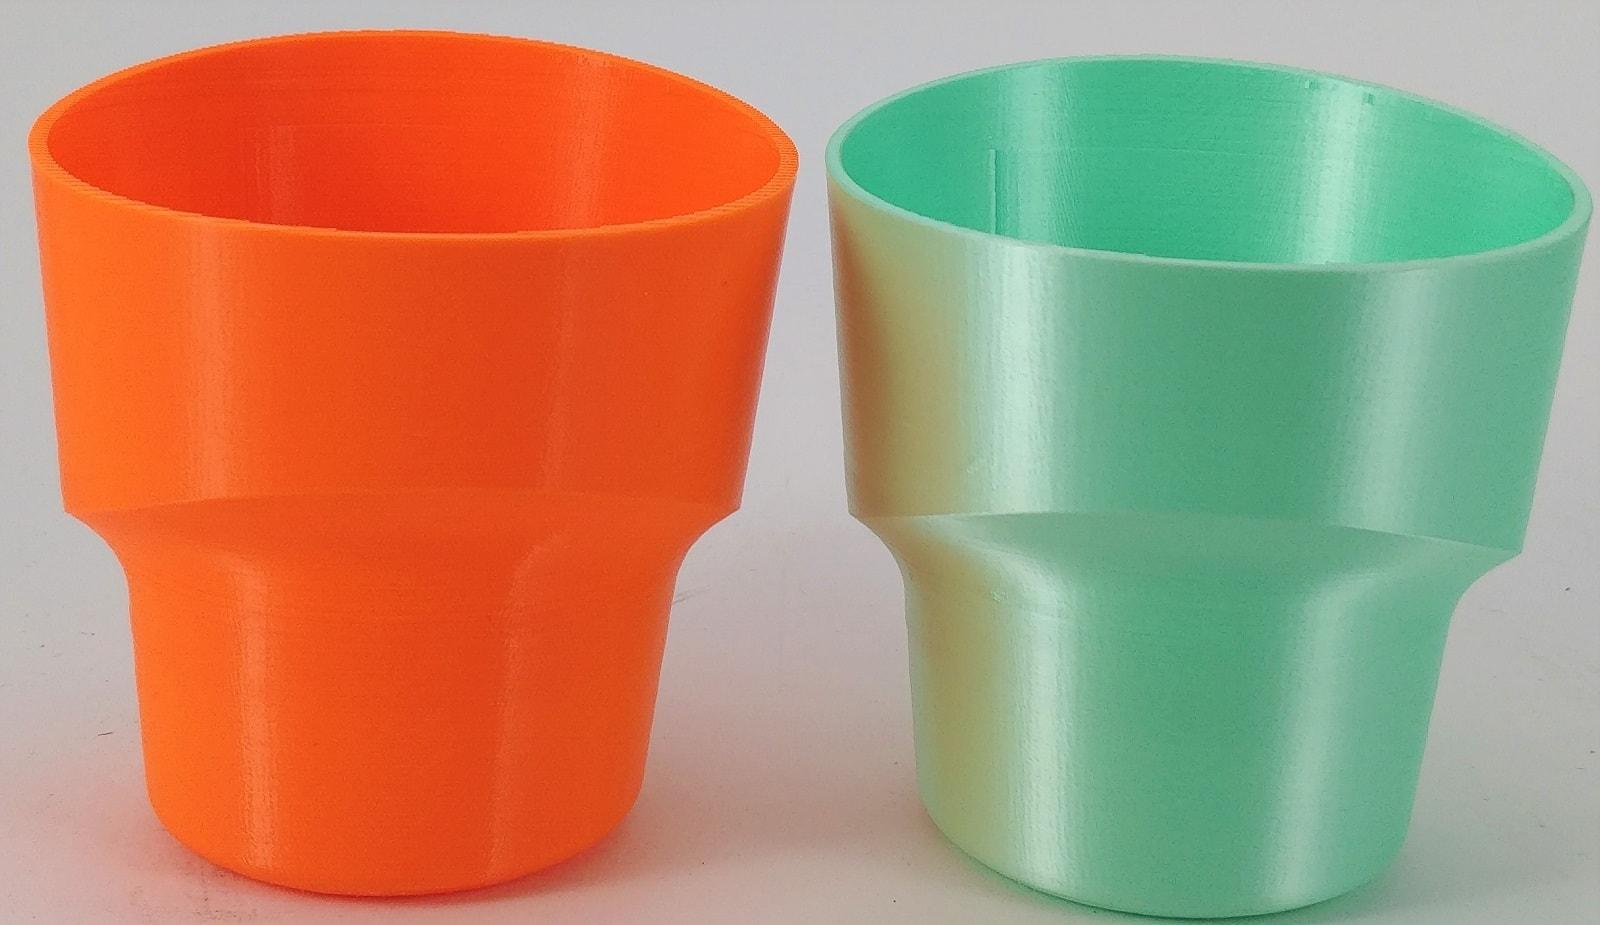 FabSilk 3D Printing Filament